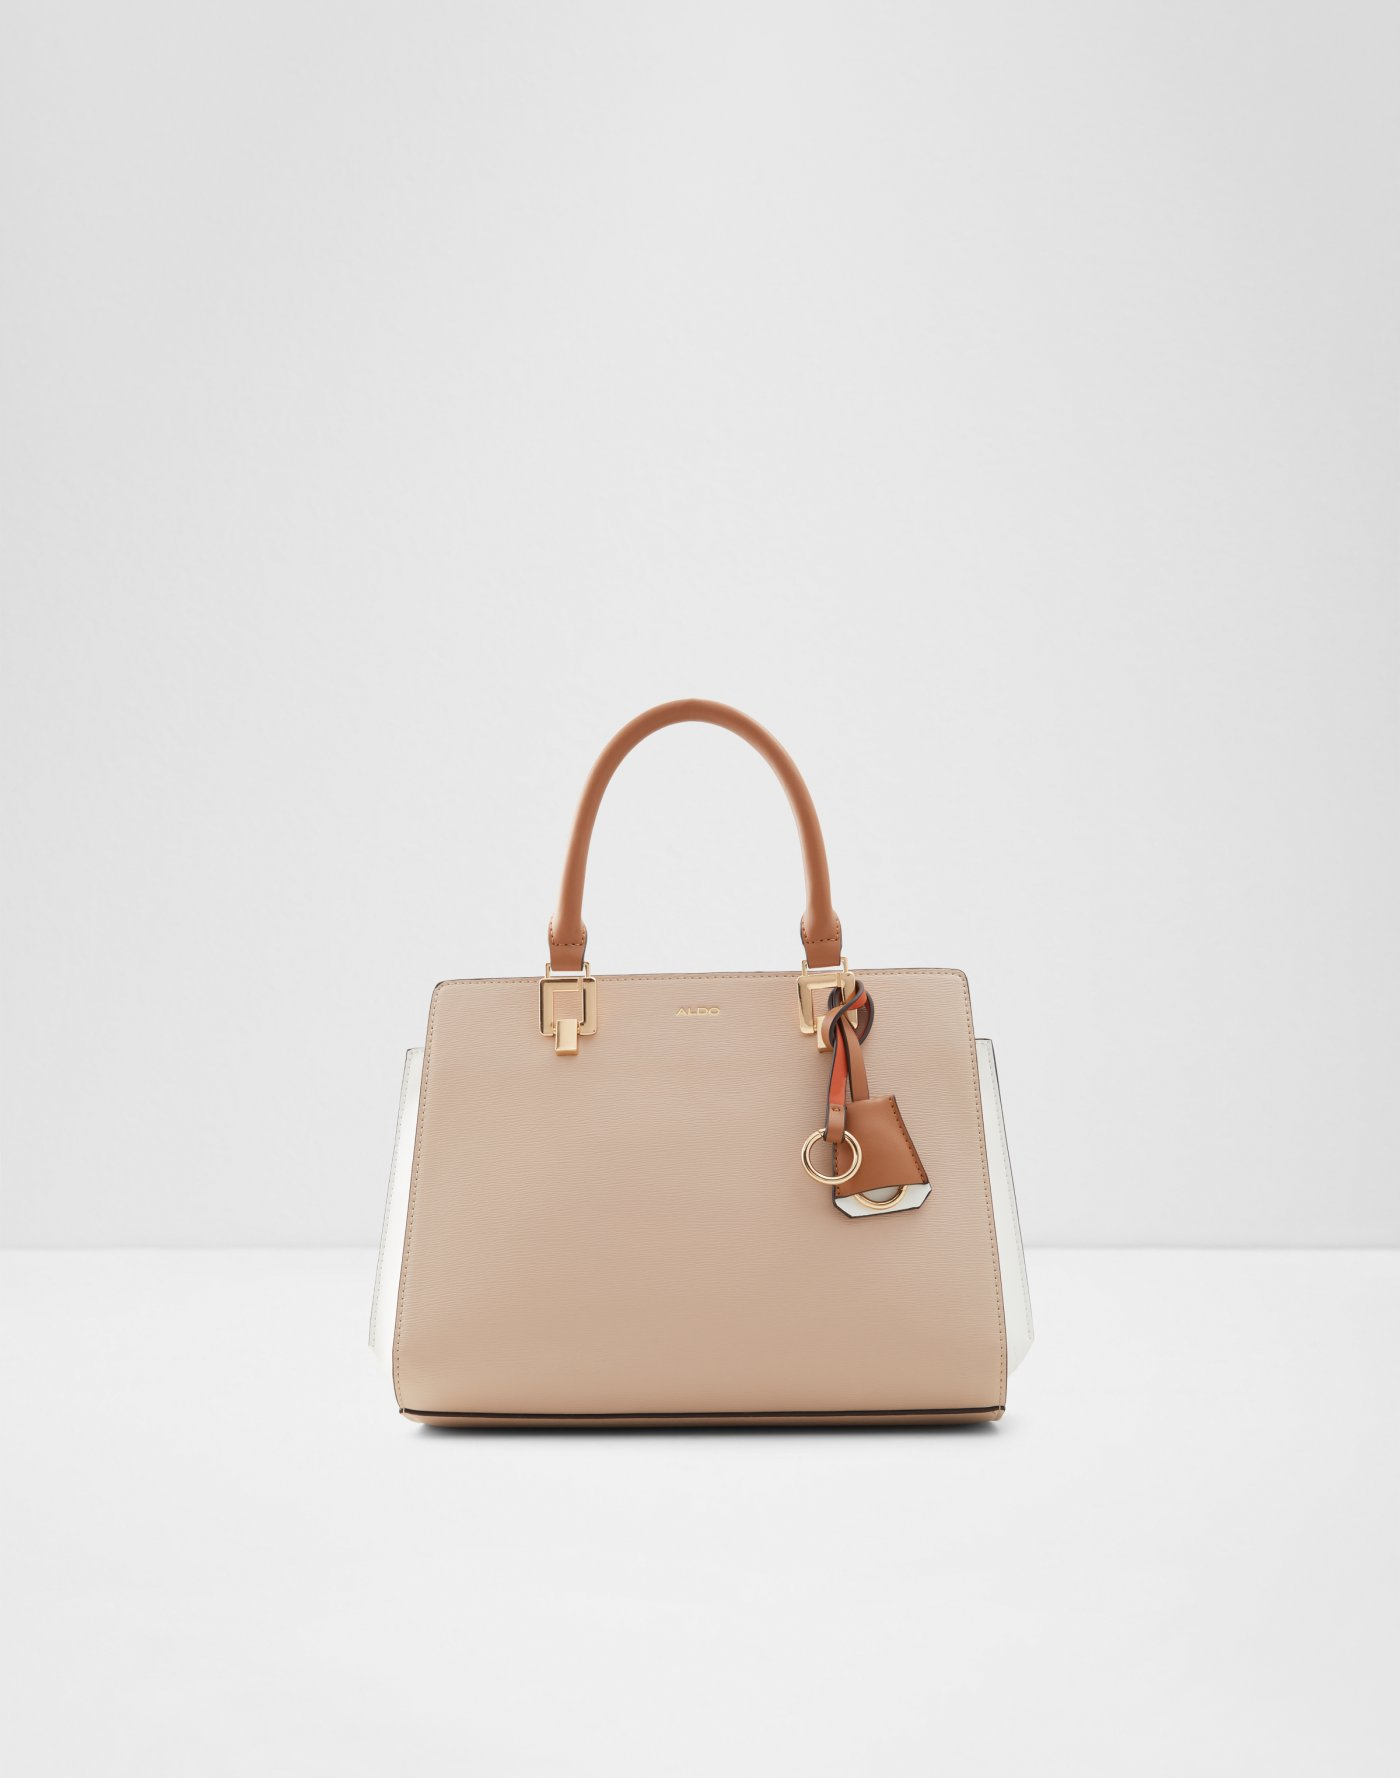 Handbags New Arrivals Aldo Canada